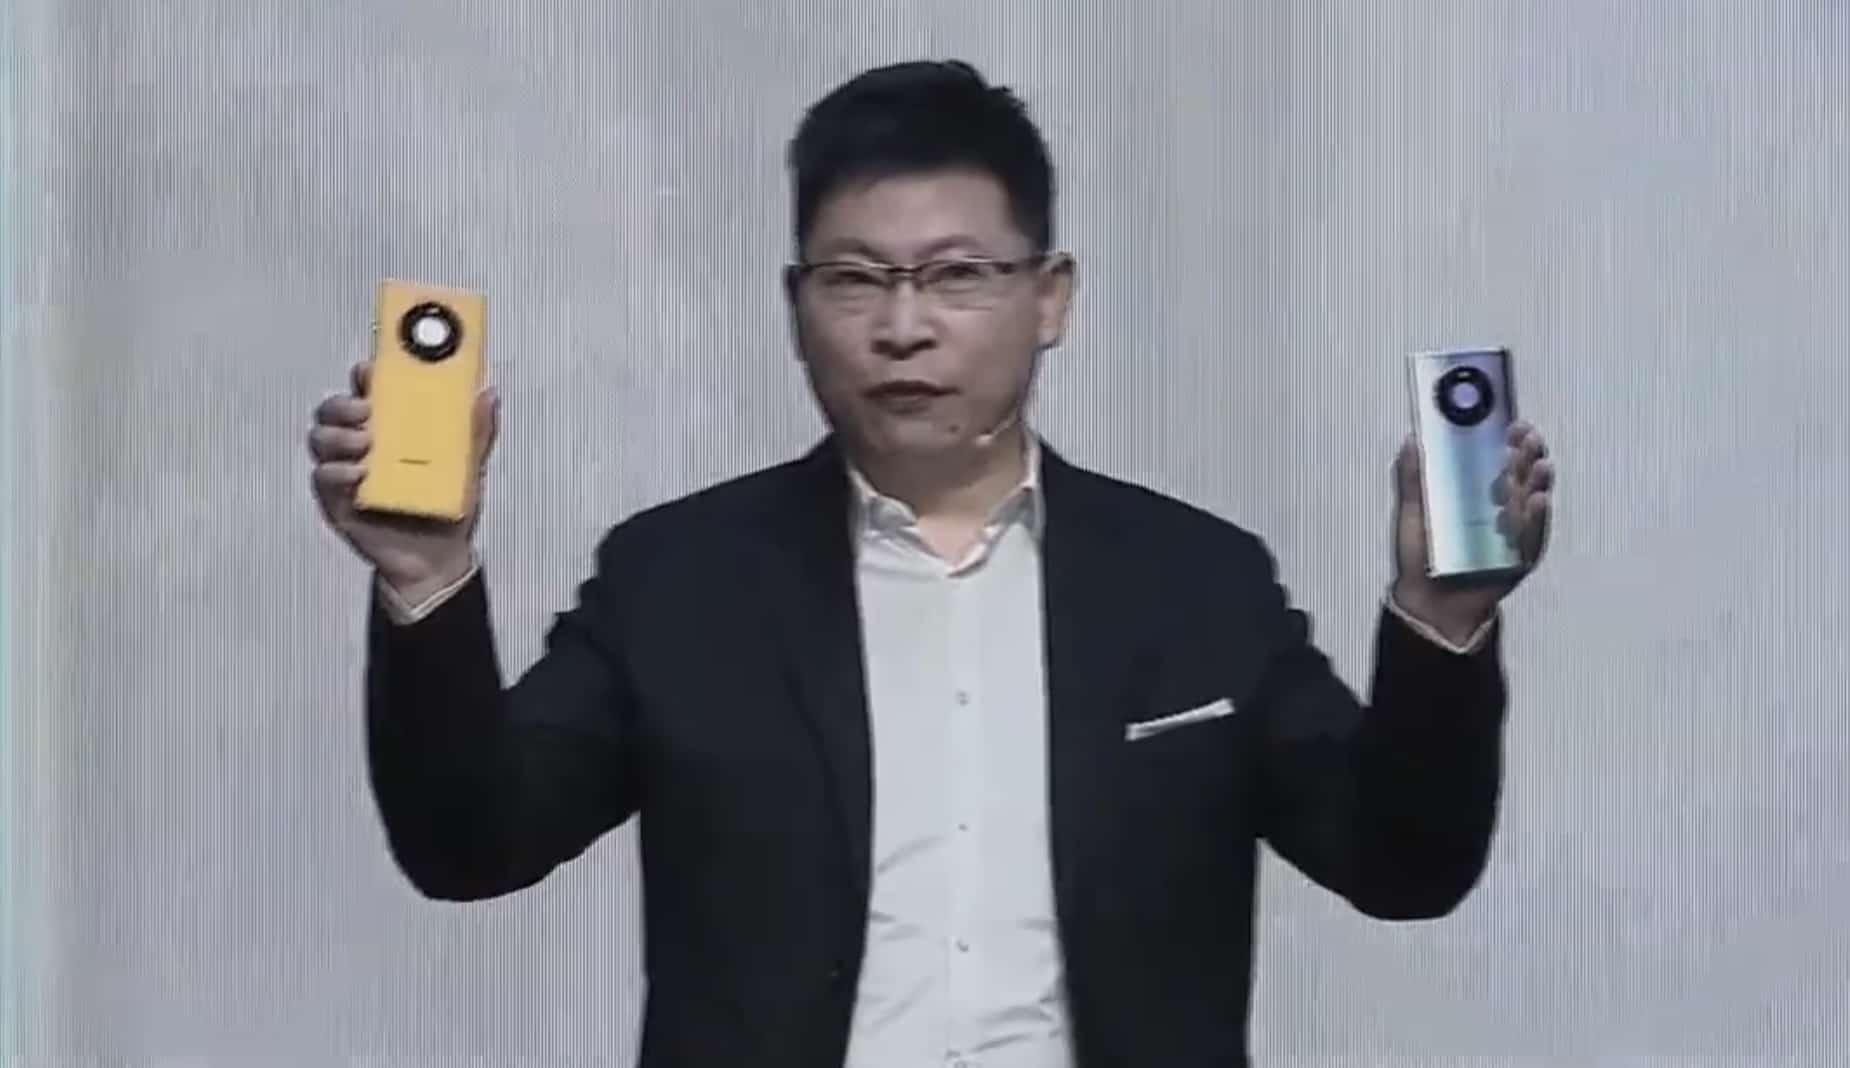 Huawei Mate 40, Huawei Mate 40 Pro, y Huawei Mate 40 Pro+